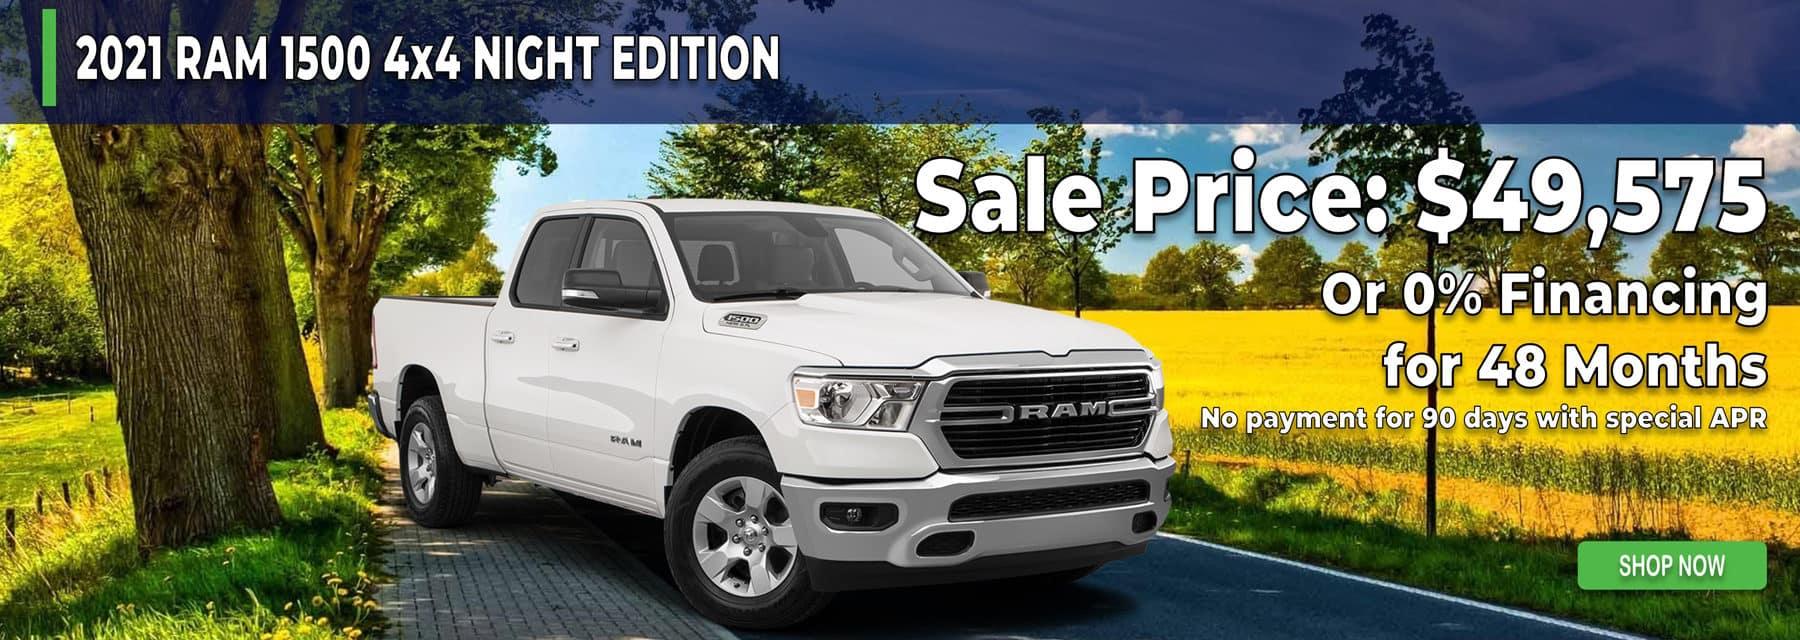 2021 Ram 1500 on sale in Mukwonago Wisconsin